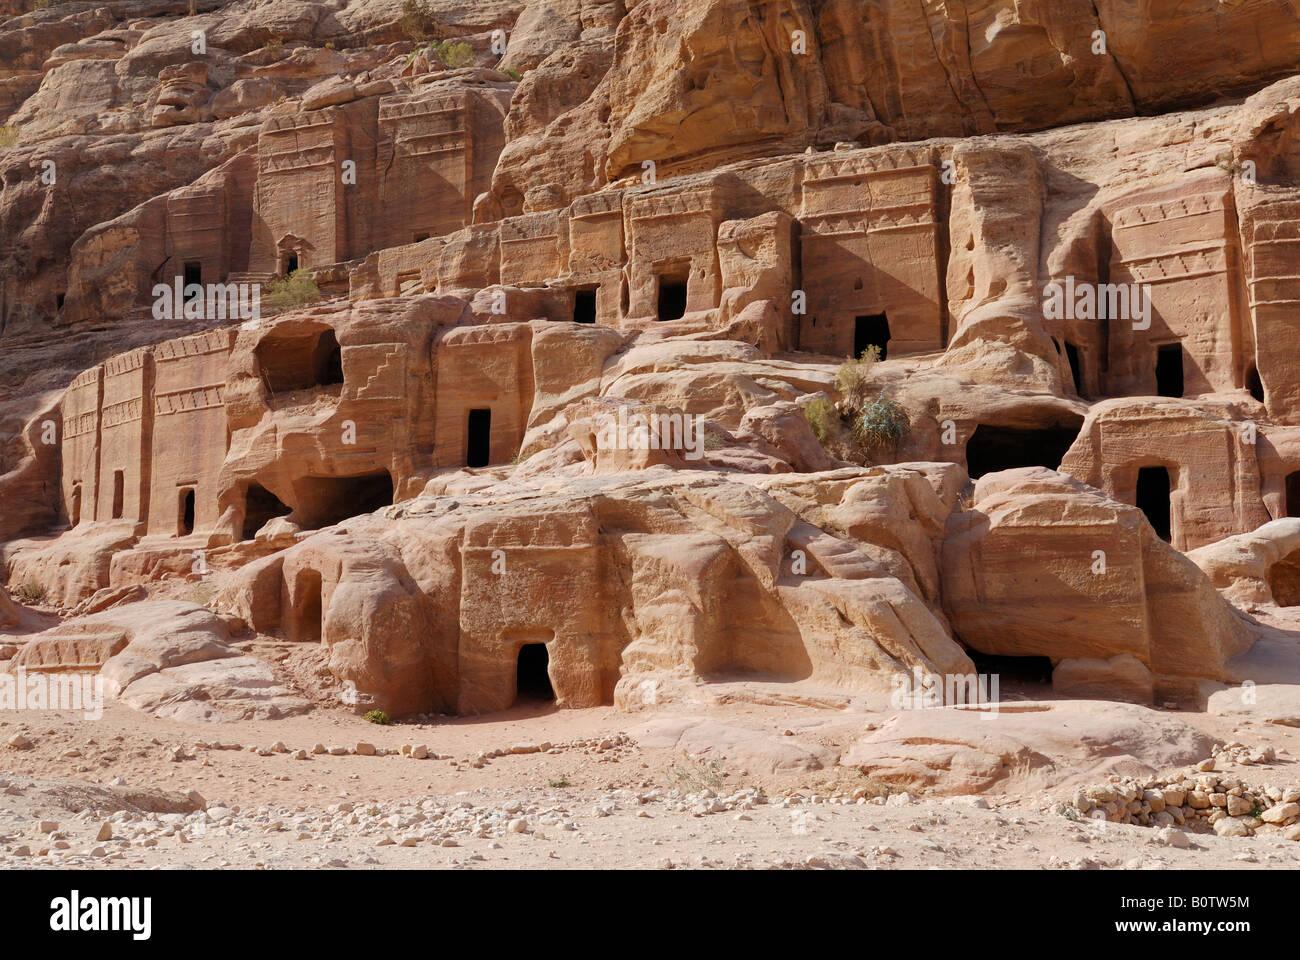 jordan ancient nabataean city petra stockfotos jordan ancient nabataean city petra bilder alamy. Black Bedroom Furniture Sets. Home Design Ideas